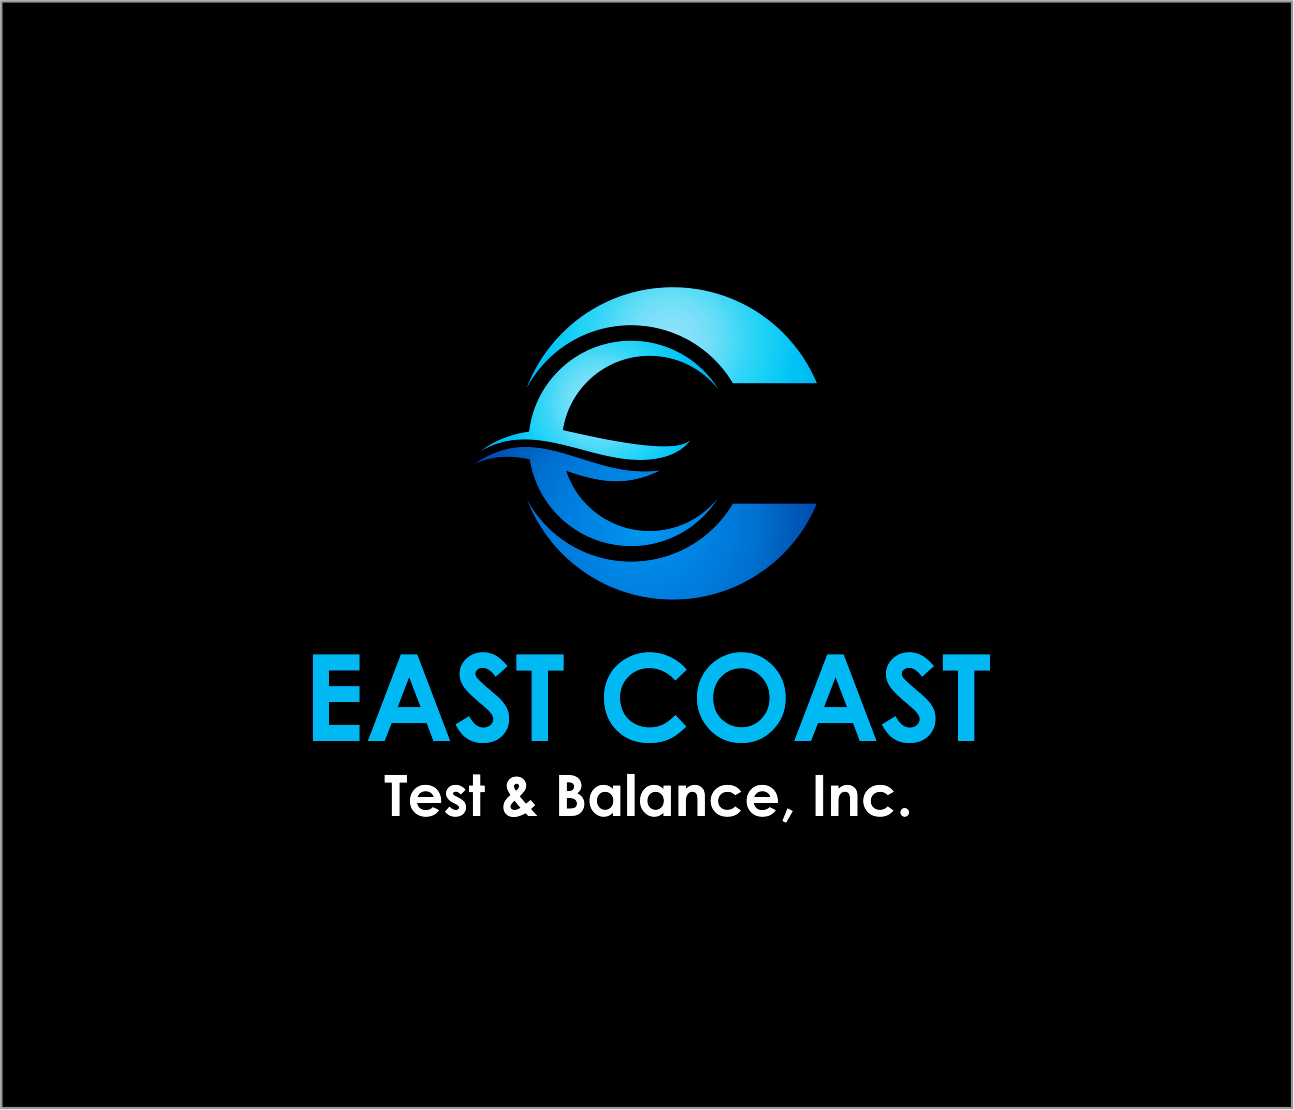 Logo Design by Armada Jamaluddin - Entry No. 47 in the Logo Design Contest Logo Design for East Coast Test & Balance, Inc. (ECTB).